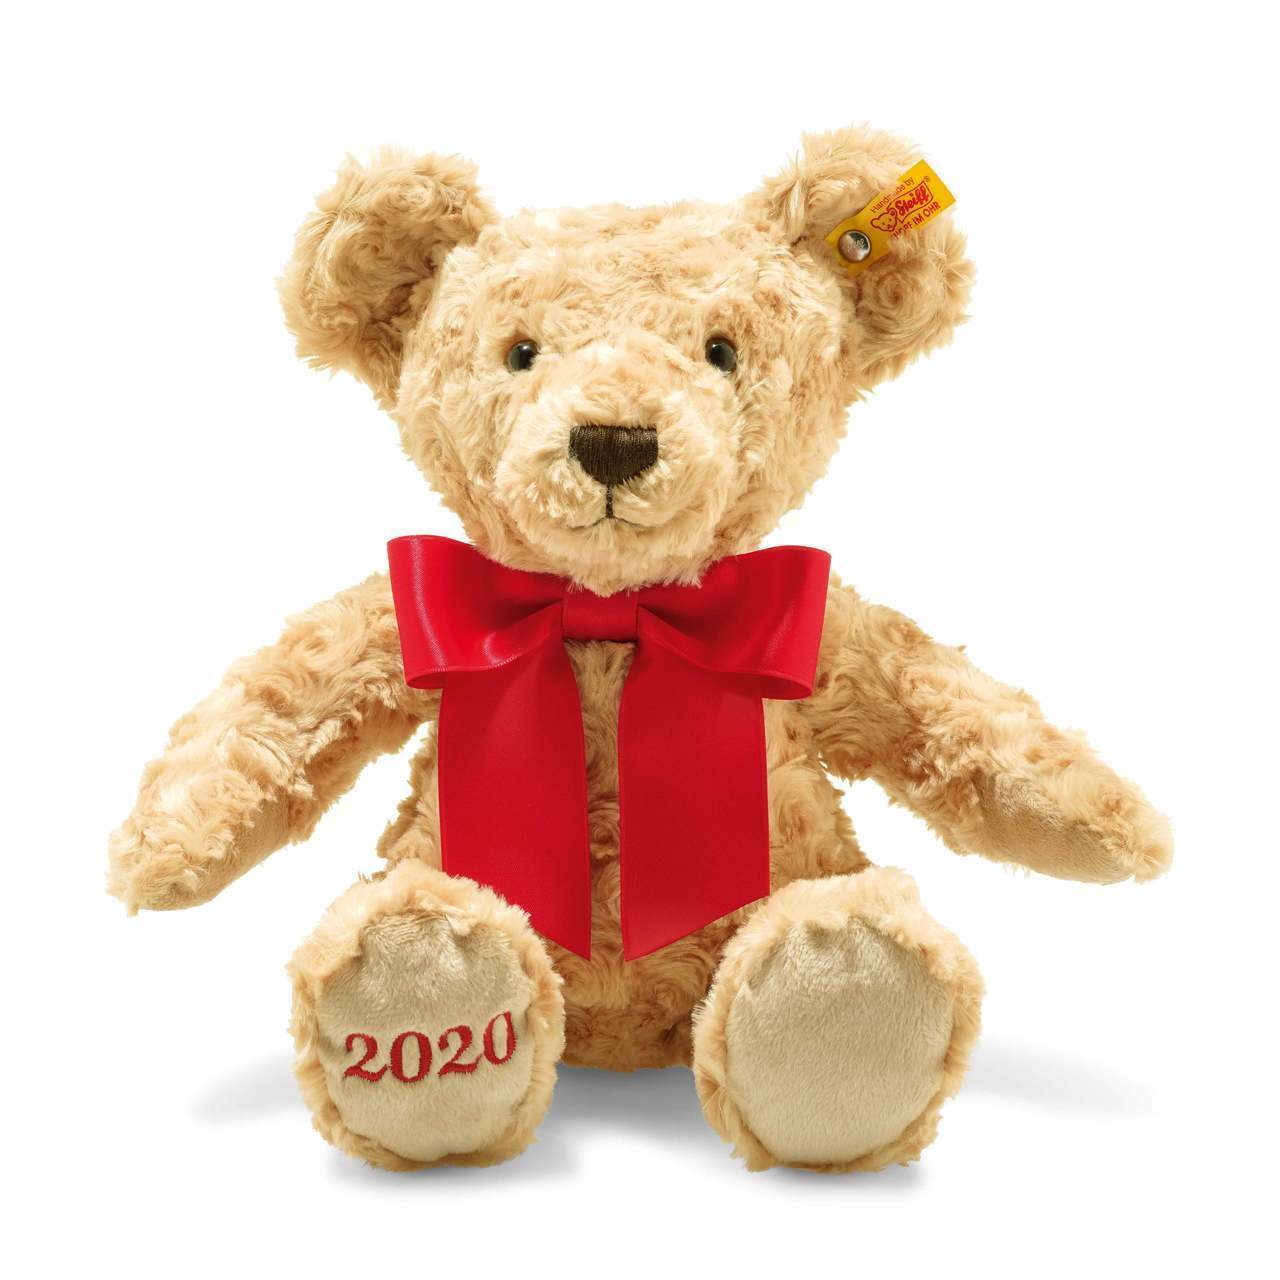 Cosy Year bear 2020 by Steiff - EAN 113475